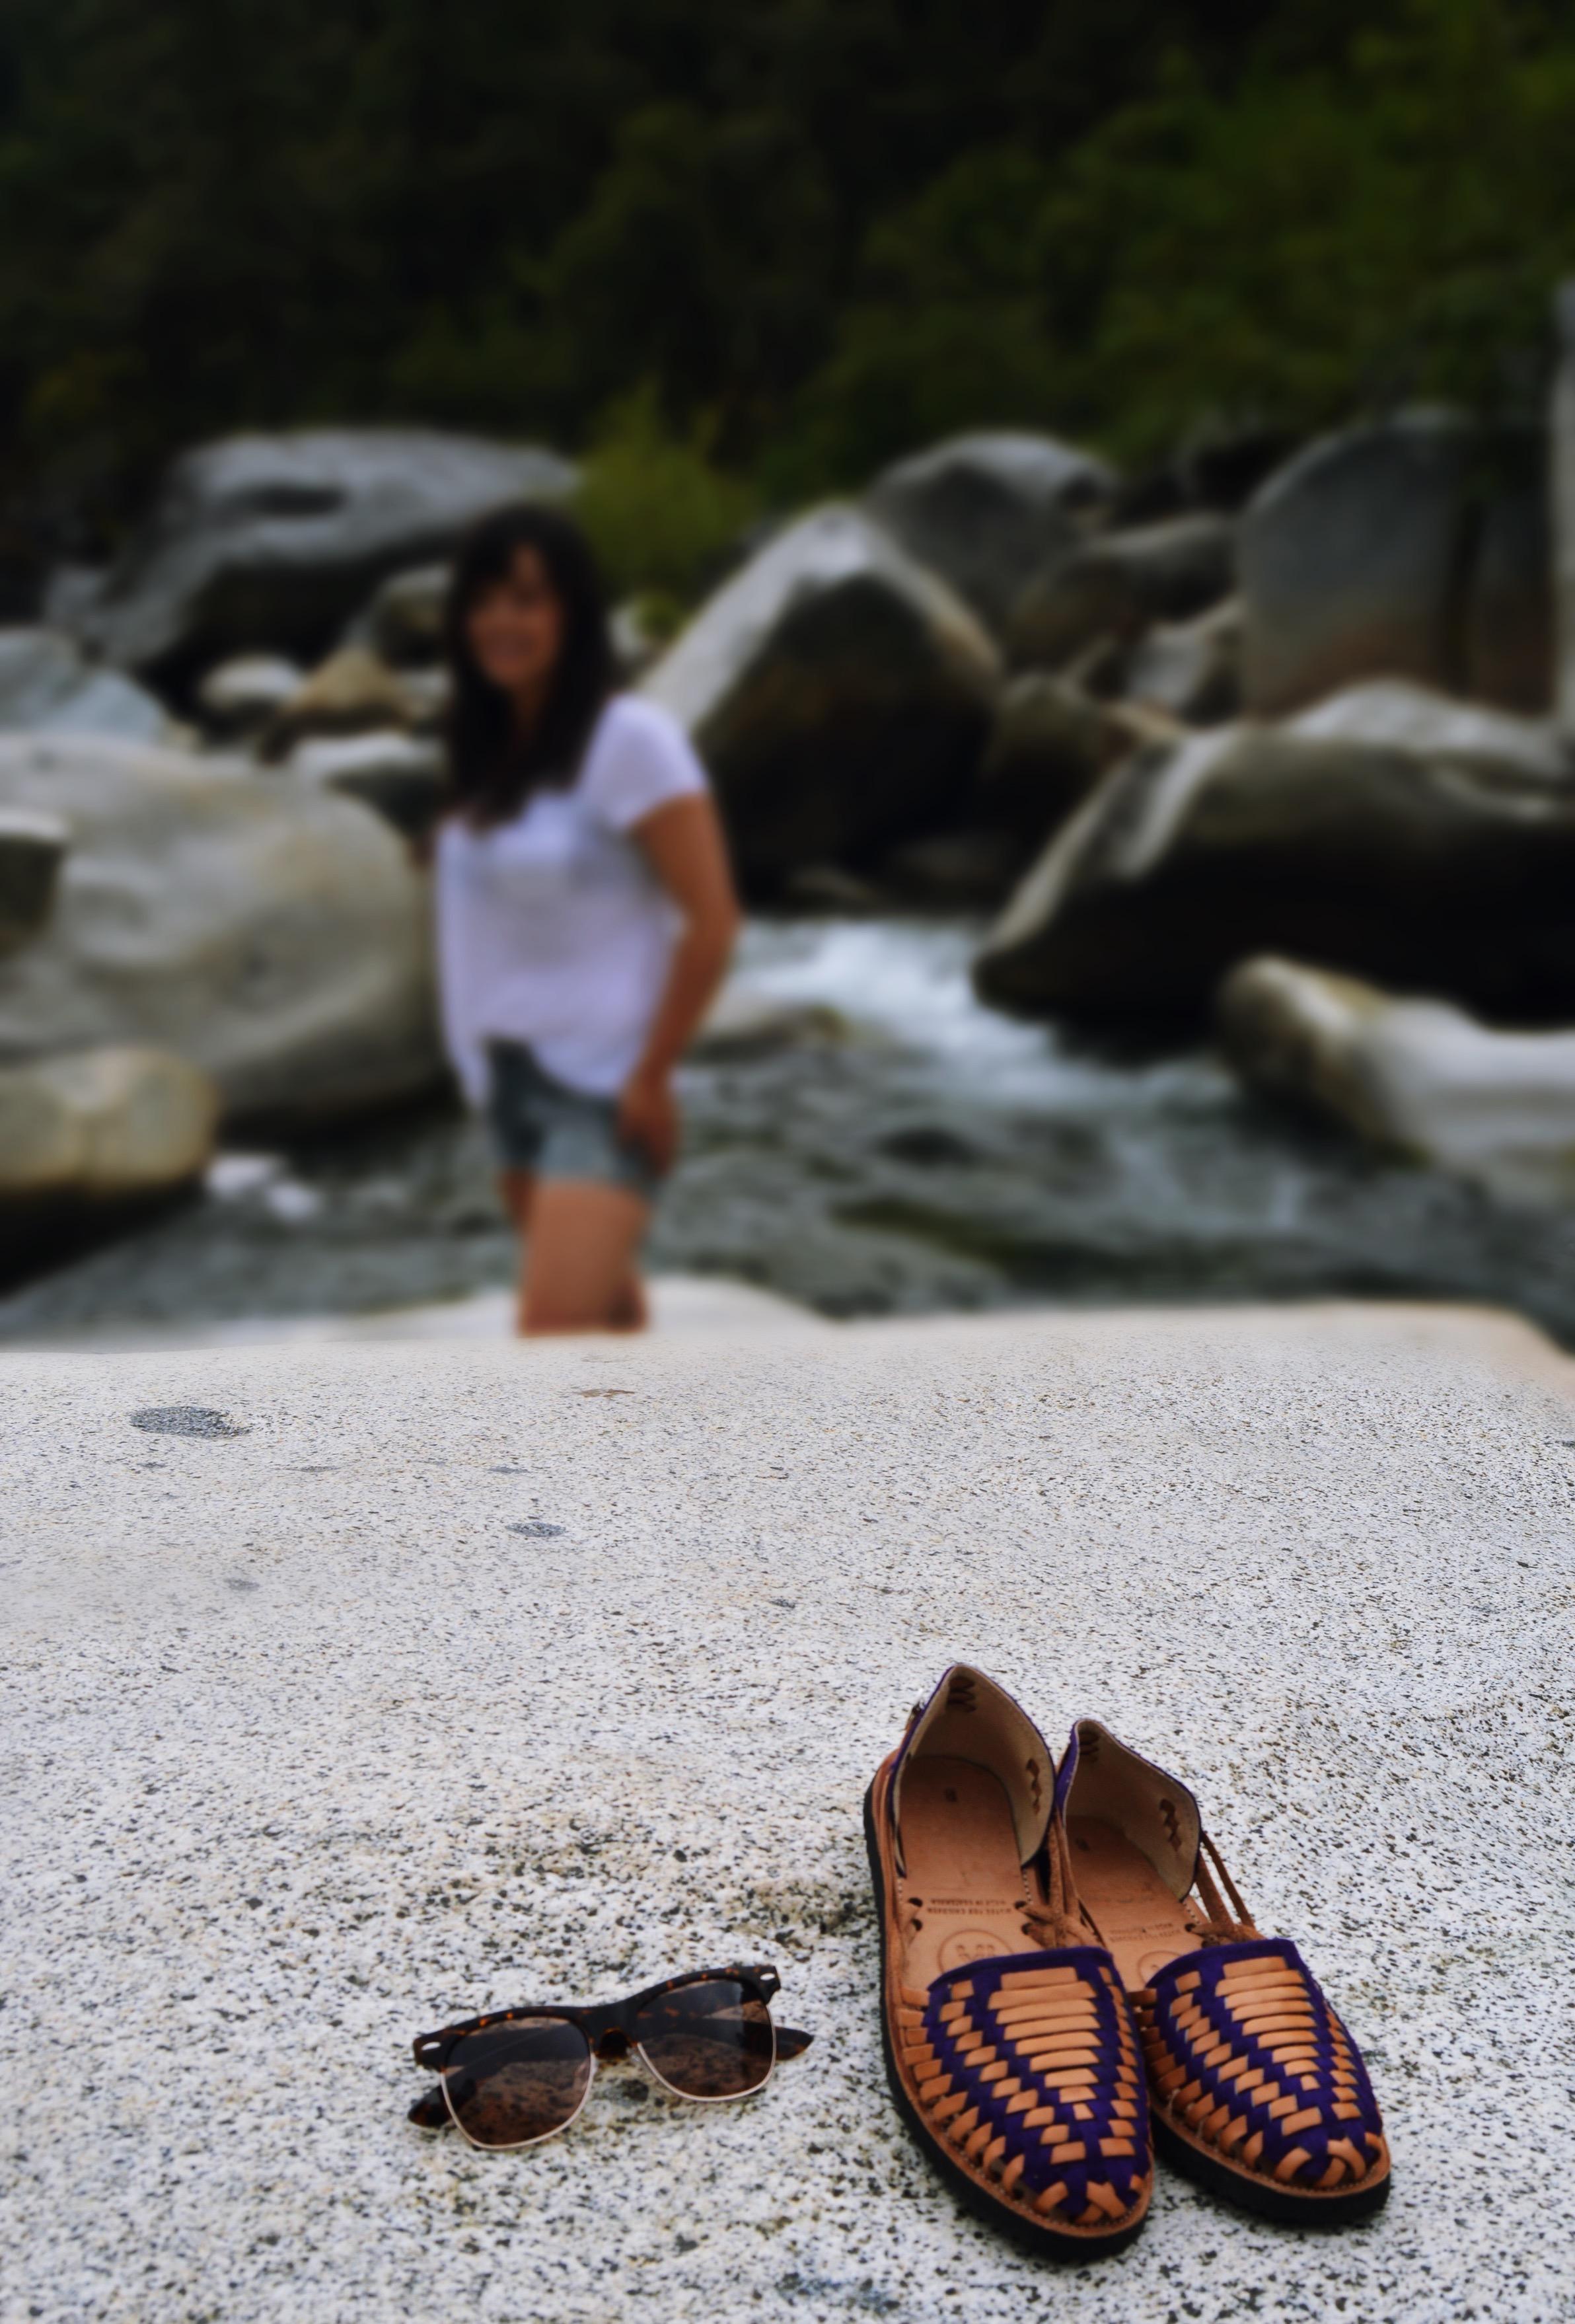 IX Sandals and Lu Curates